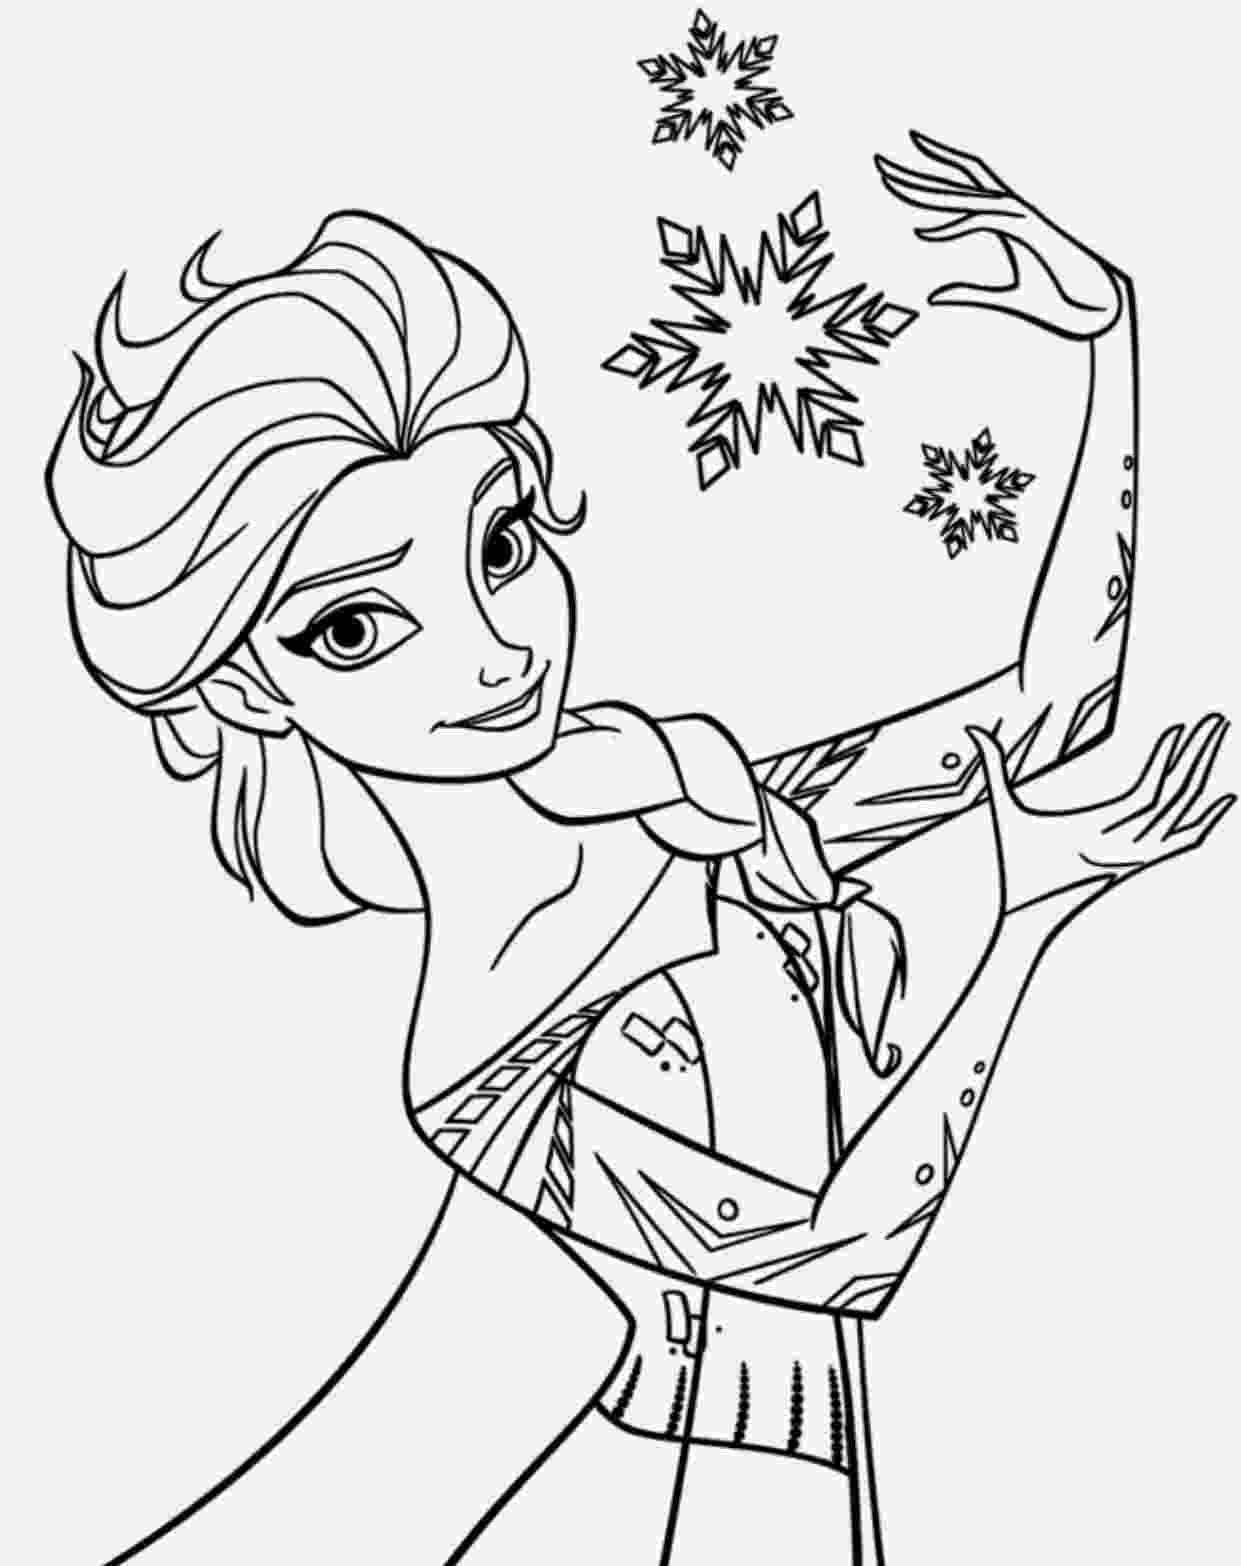 frozen coloring books 15 beautiful disney frozen coloring pages free instant coloring books frozen